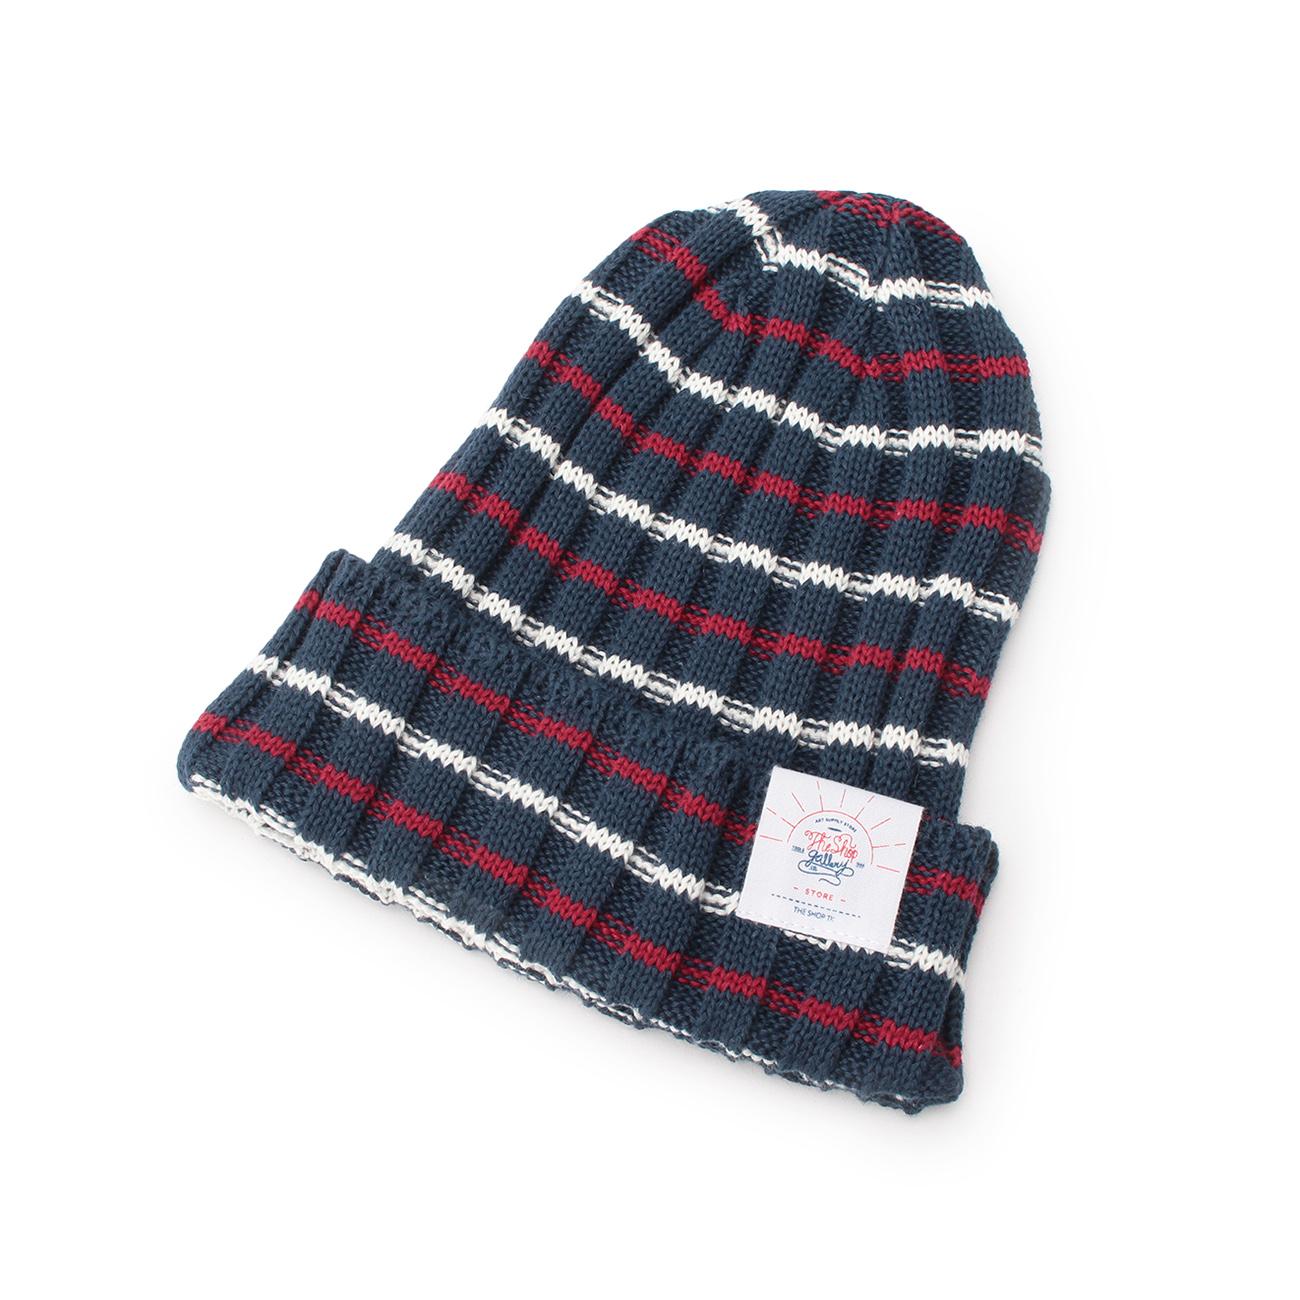 【THE SHOP TK(Men) (ザ ショップ ティーケー(メンズ))】コットンリネンボーダービーニー帽メンズ 帽子|ハット ネイビー